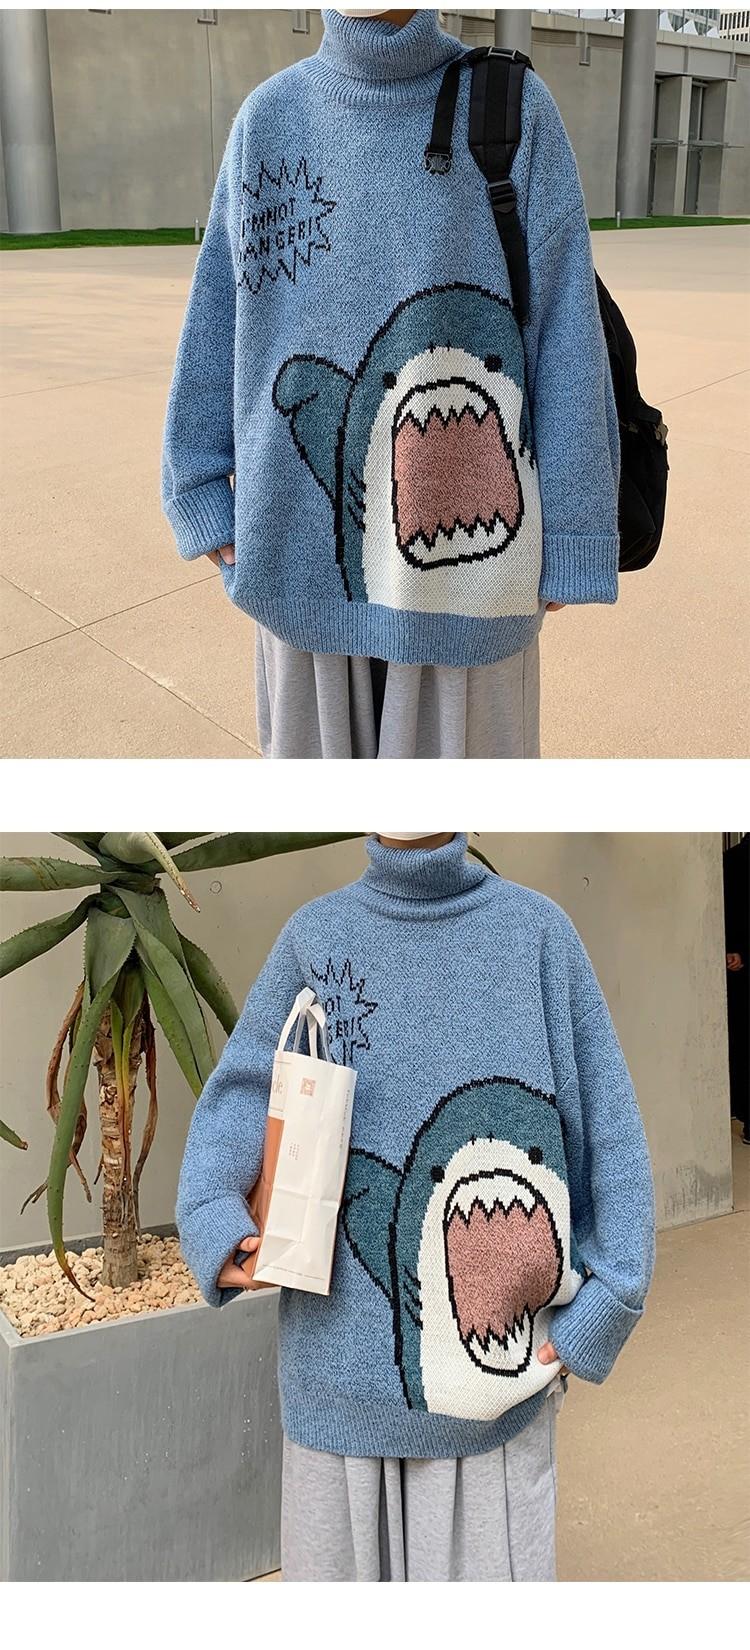 Harajuku E-boy E-girl Turtlenecks Oversized Shark Sweater 41